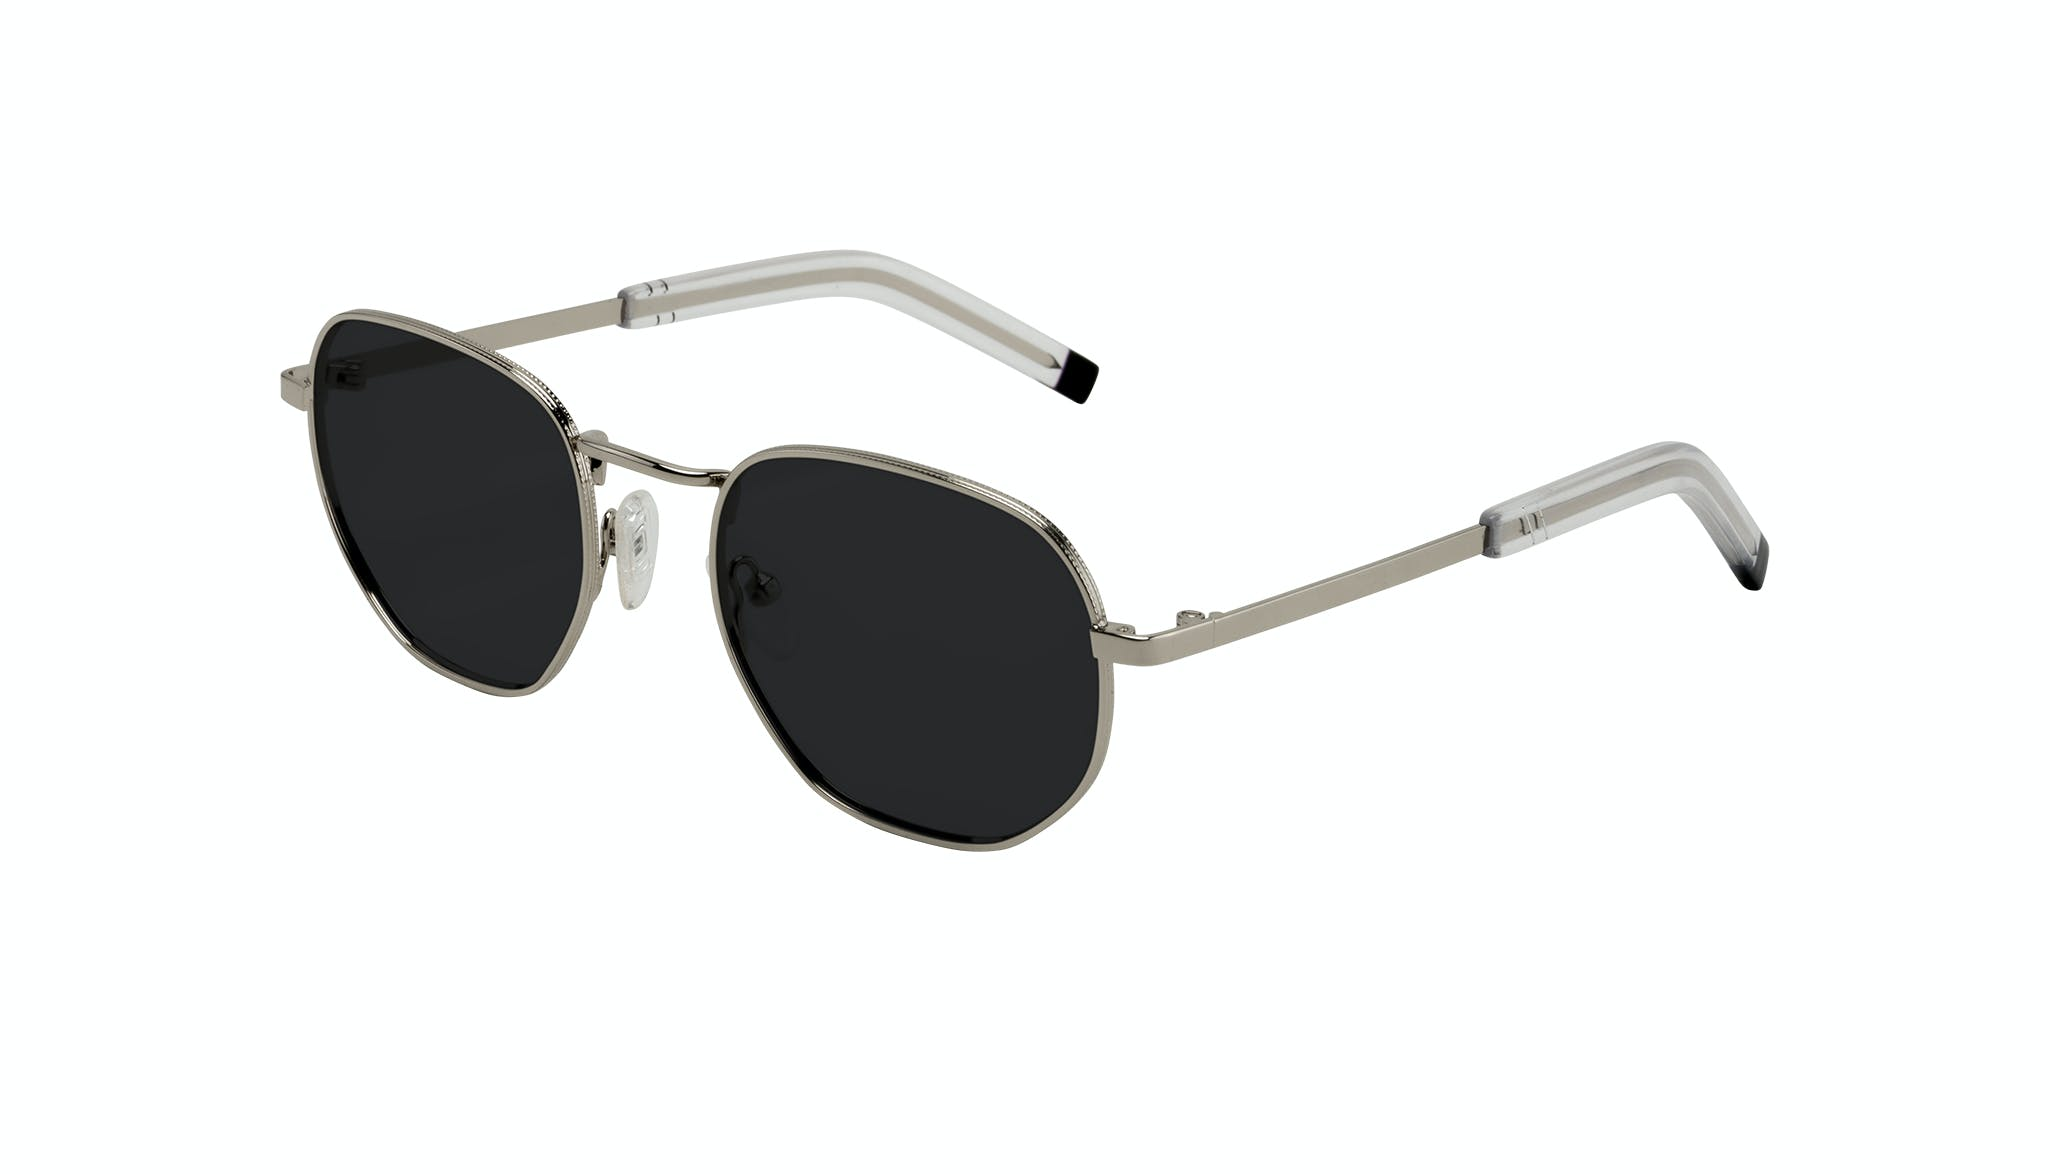 Affordable Fashion Glasses Round Sunglasses Men Rise Silver Tilt